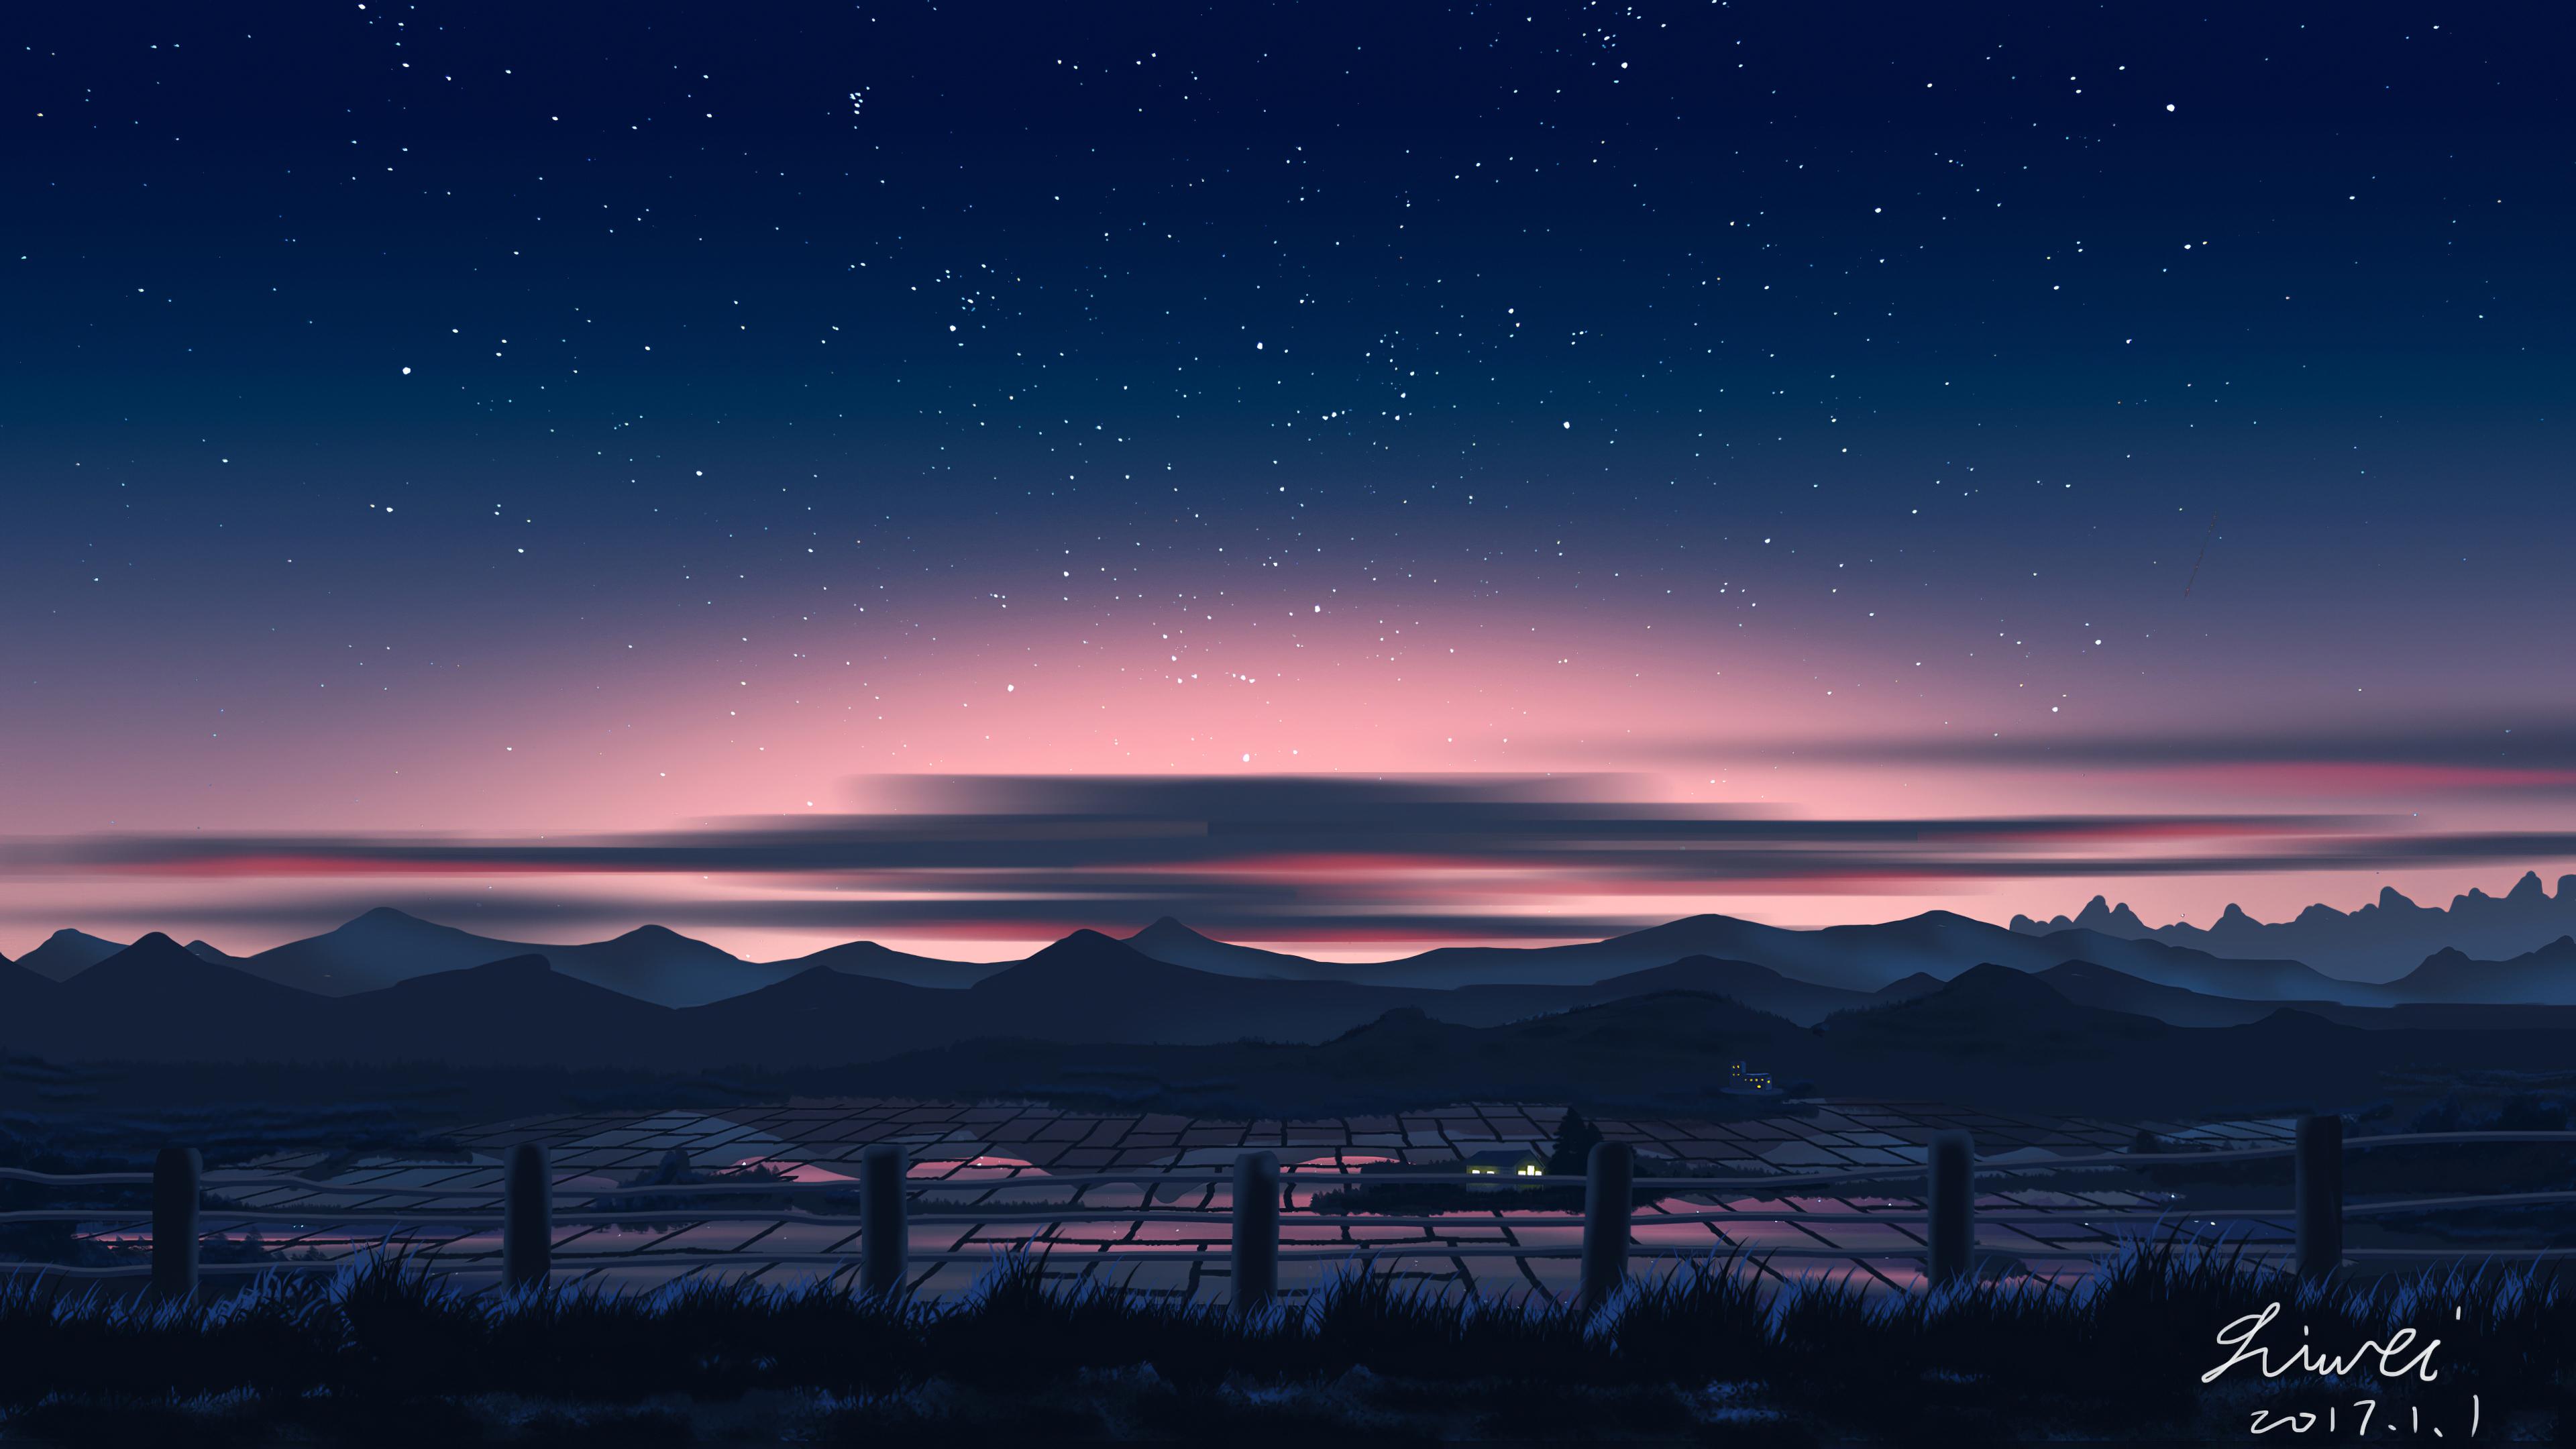 country side starry sky 1578255385 - Country Side Starry Sky -